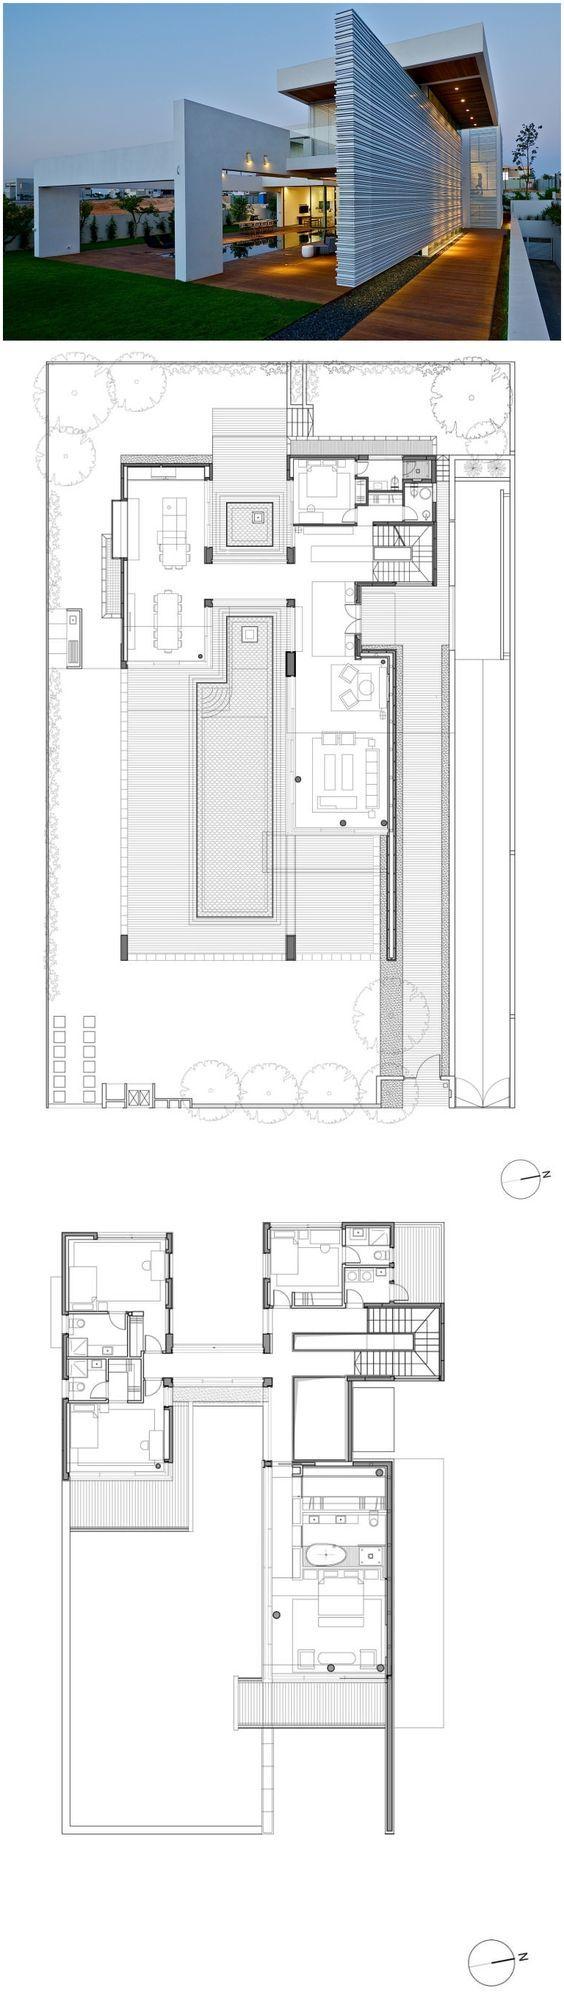 Erdgeschoss haus front design  best interessante ontwerpen images on pinterest  arquitetura